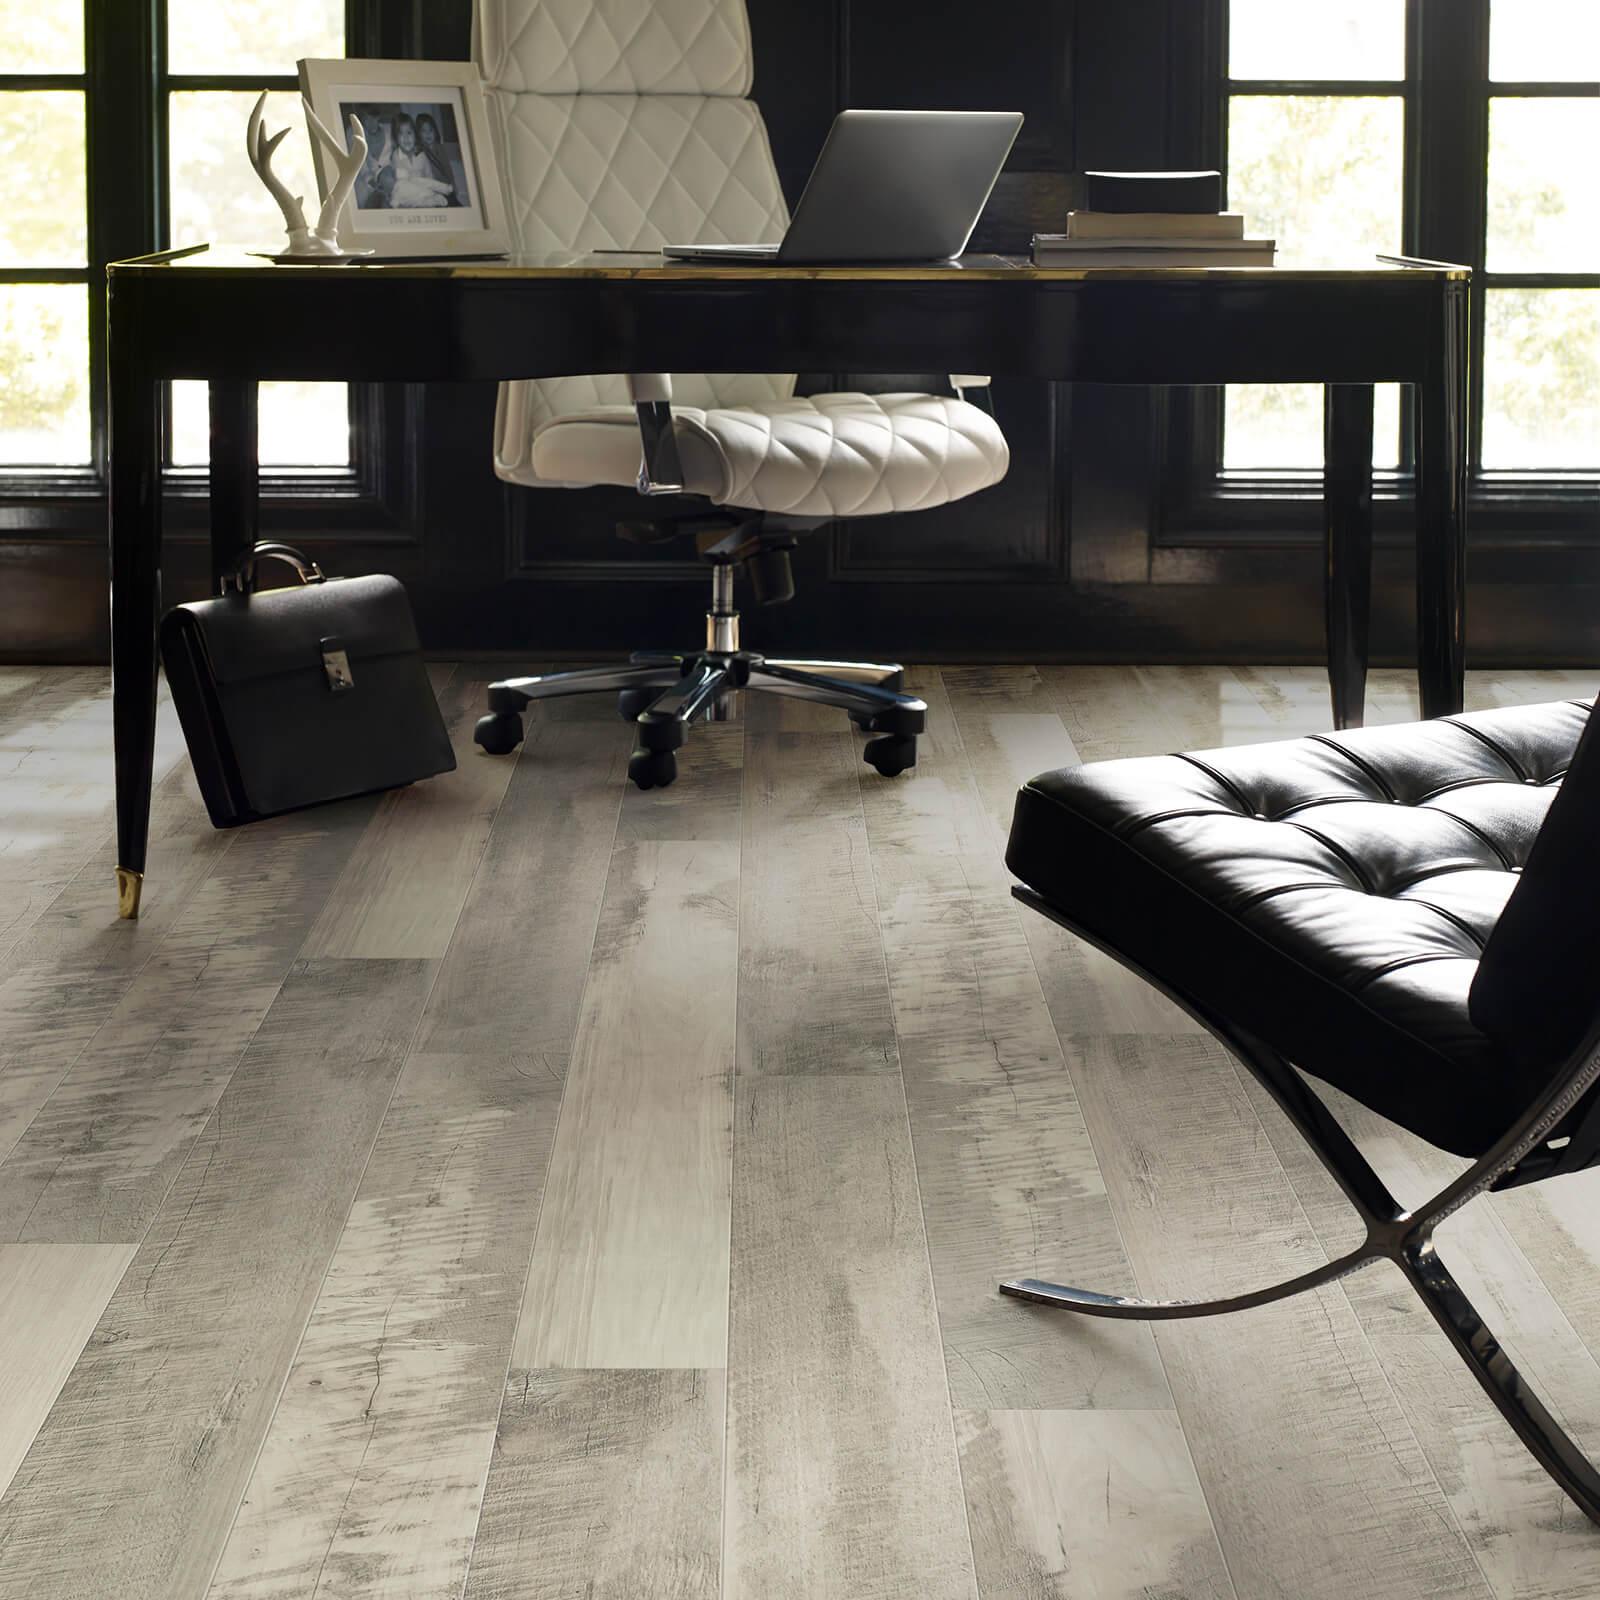 Office Hardwood Floor | Terry's Floor Fashions